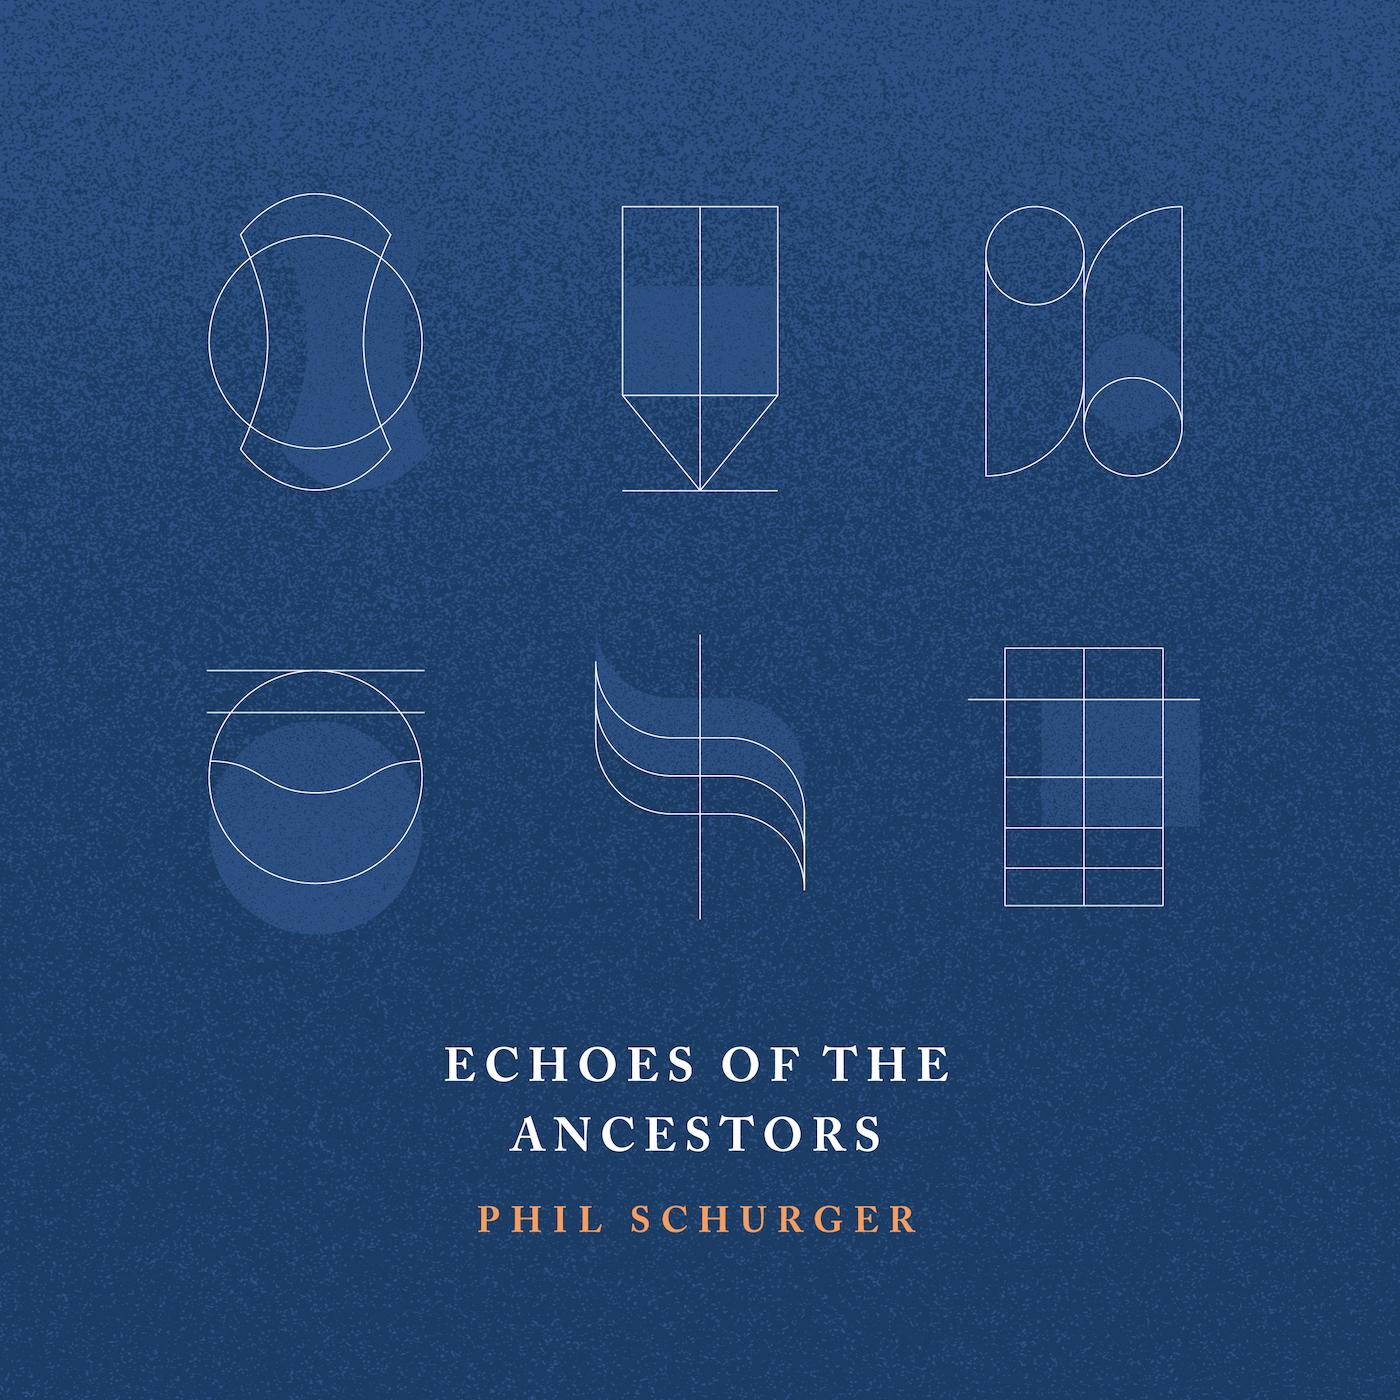 Phil Schurger | Echoes of the Ancestors   Released Sept 22nd   Order  CD/digital